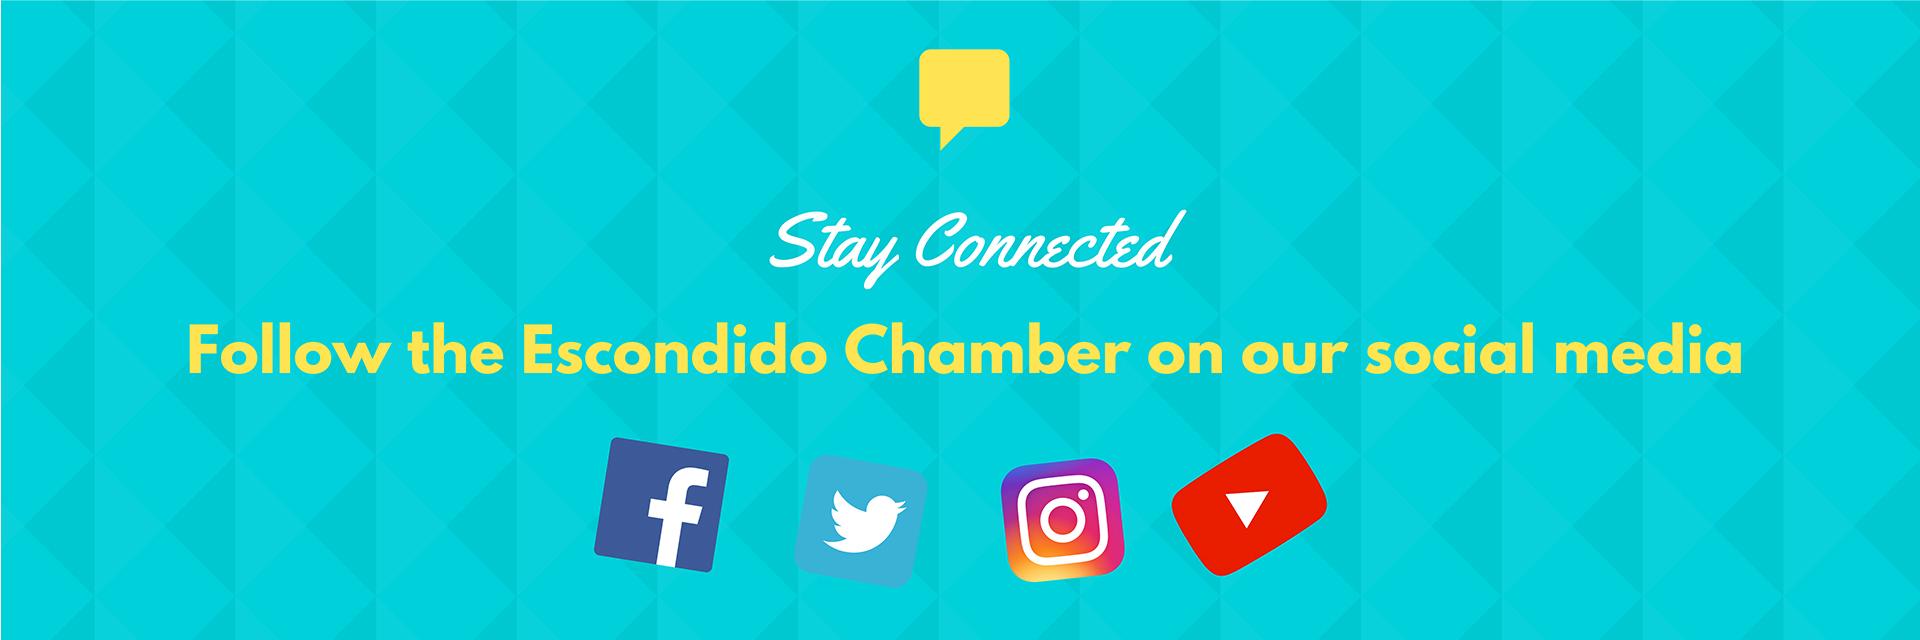 escondido chamber social media